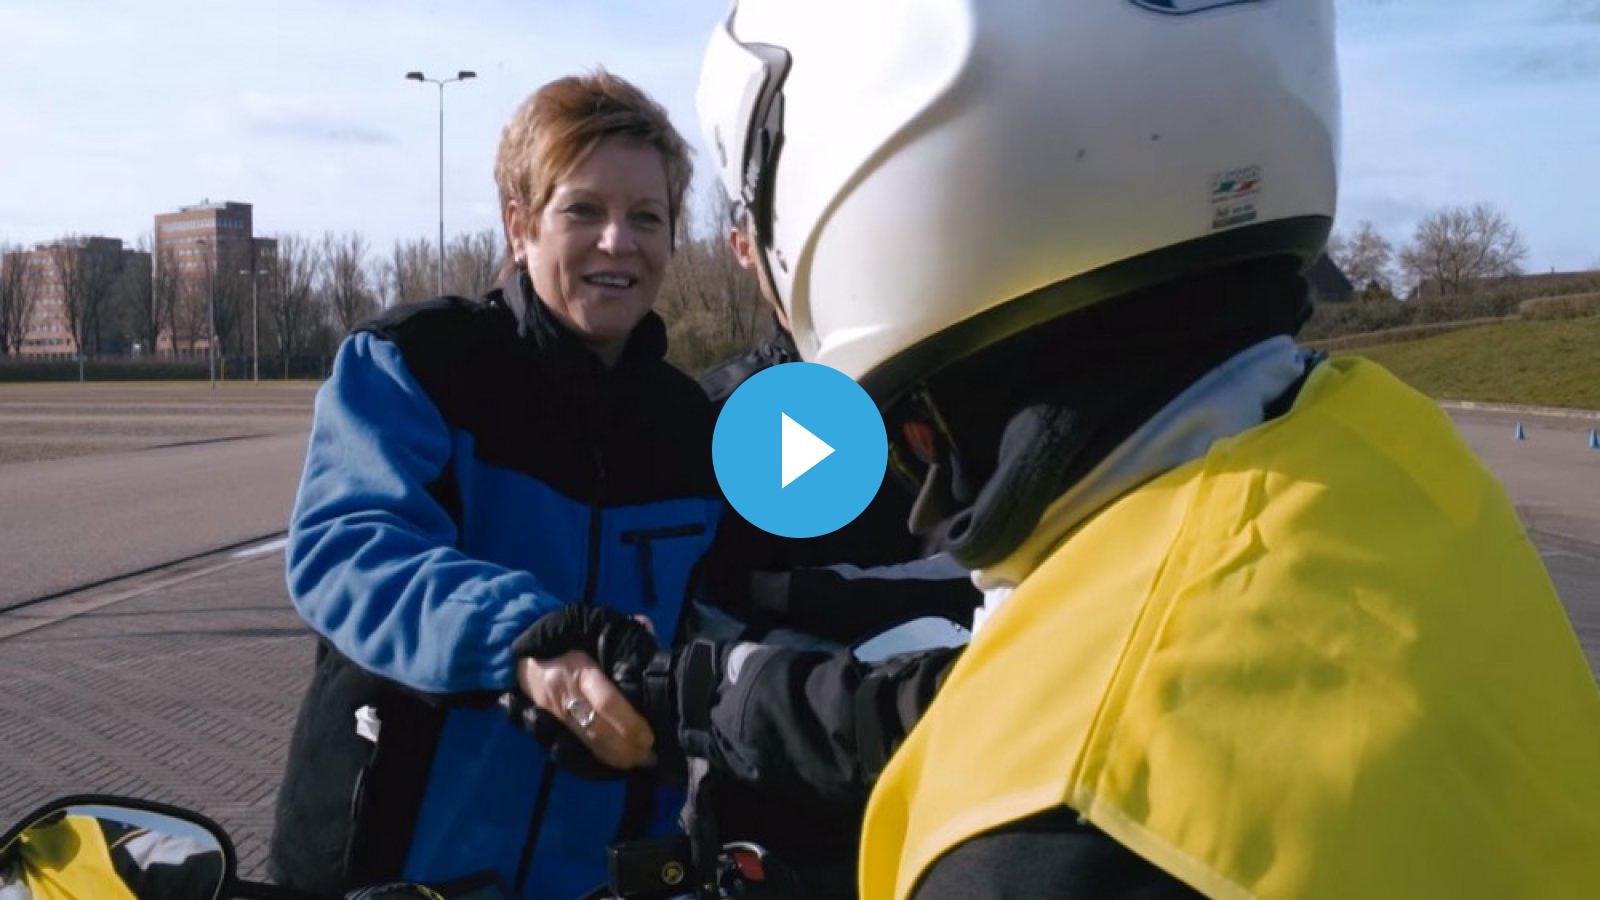 voertuigbeheersing-video-thumb